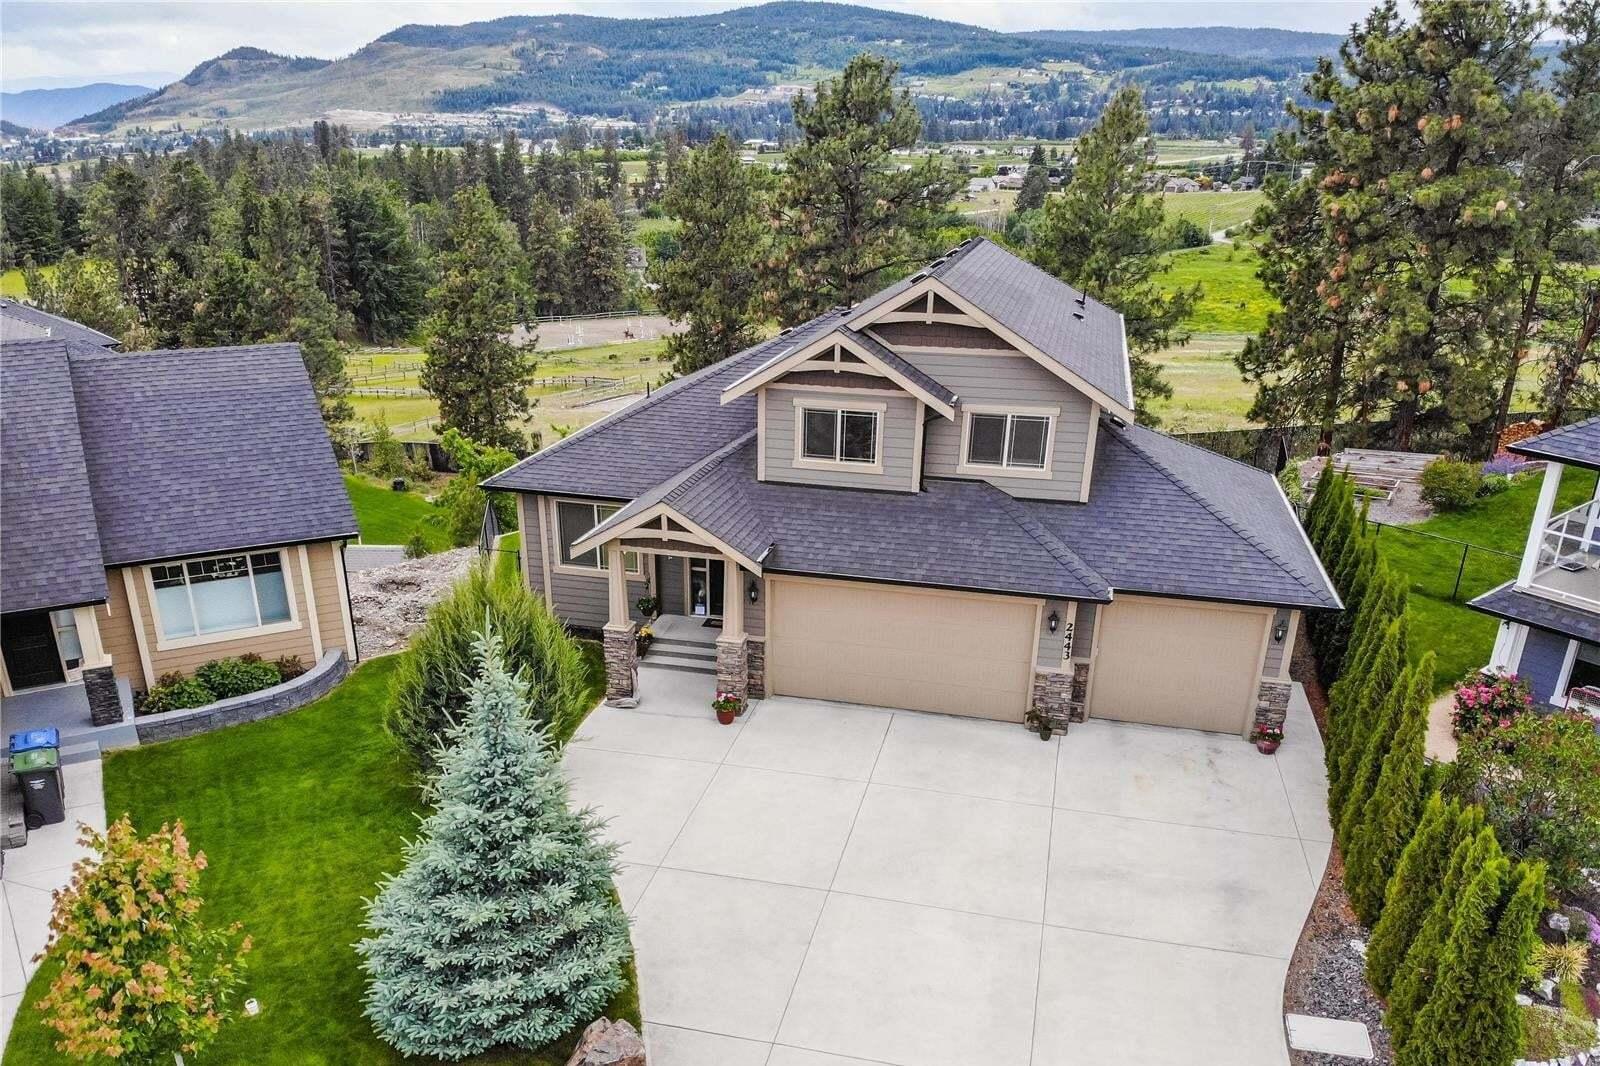 House for sale at 2443 Saddleback Wy West Kelowna British Columbia - MLS: 10207993